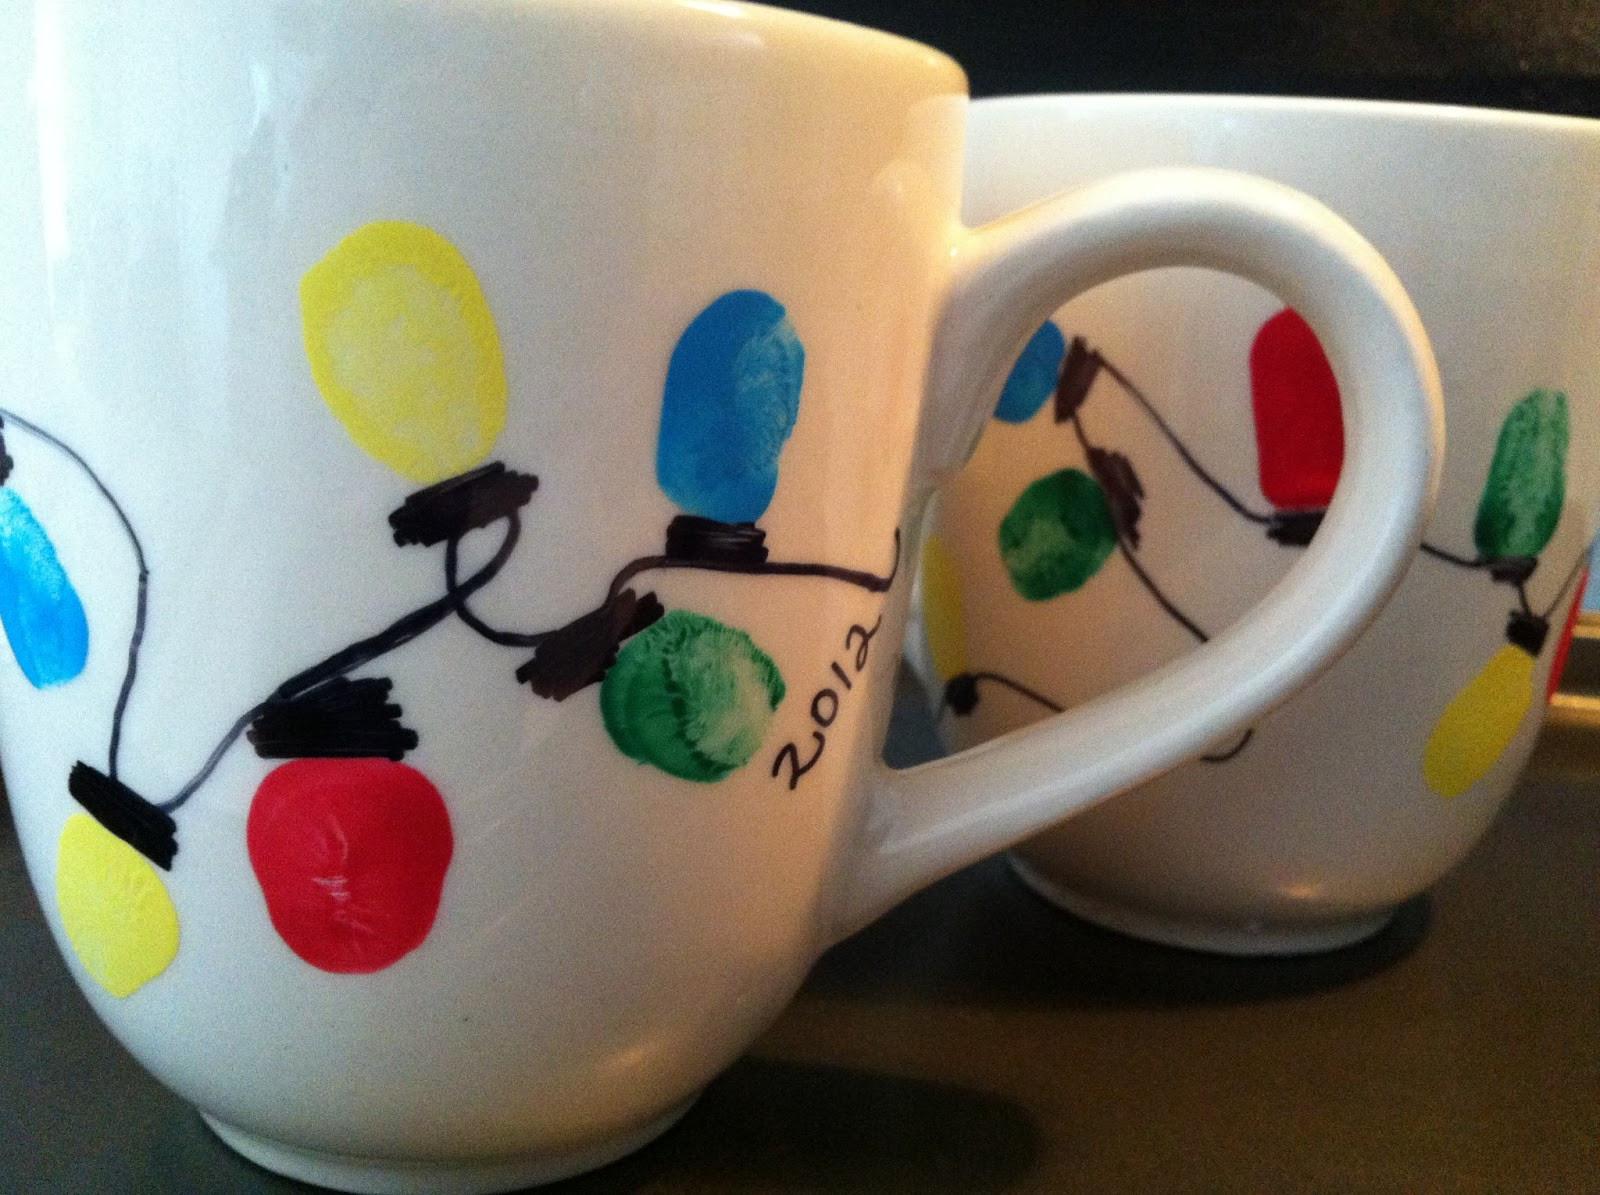 DIY Christmas Mug  Handmade by CJ DIY Christmas Sharpie Mugs